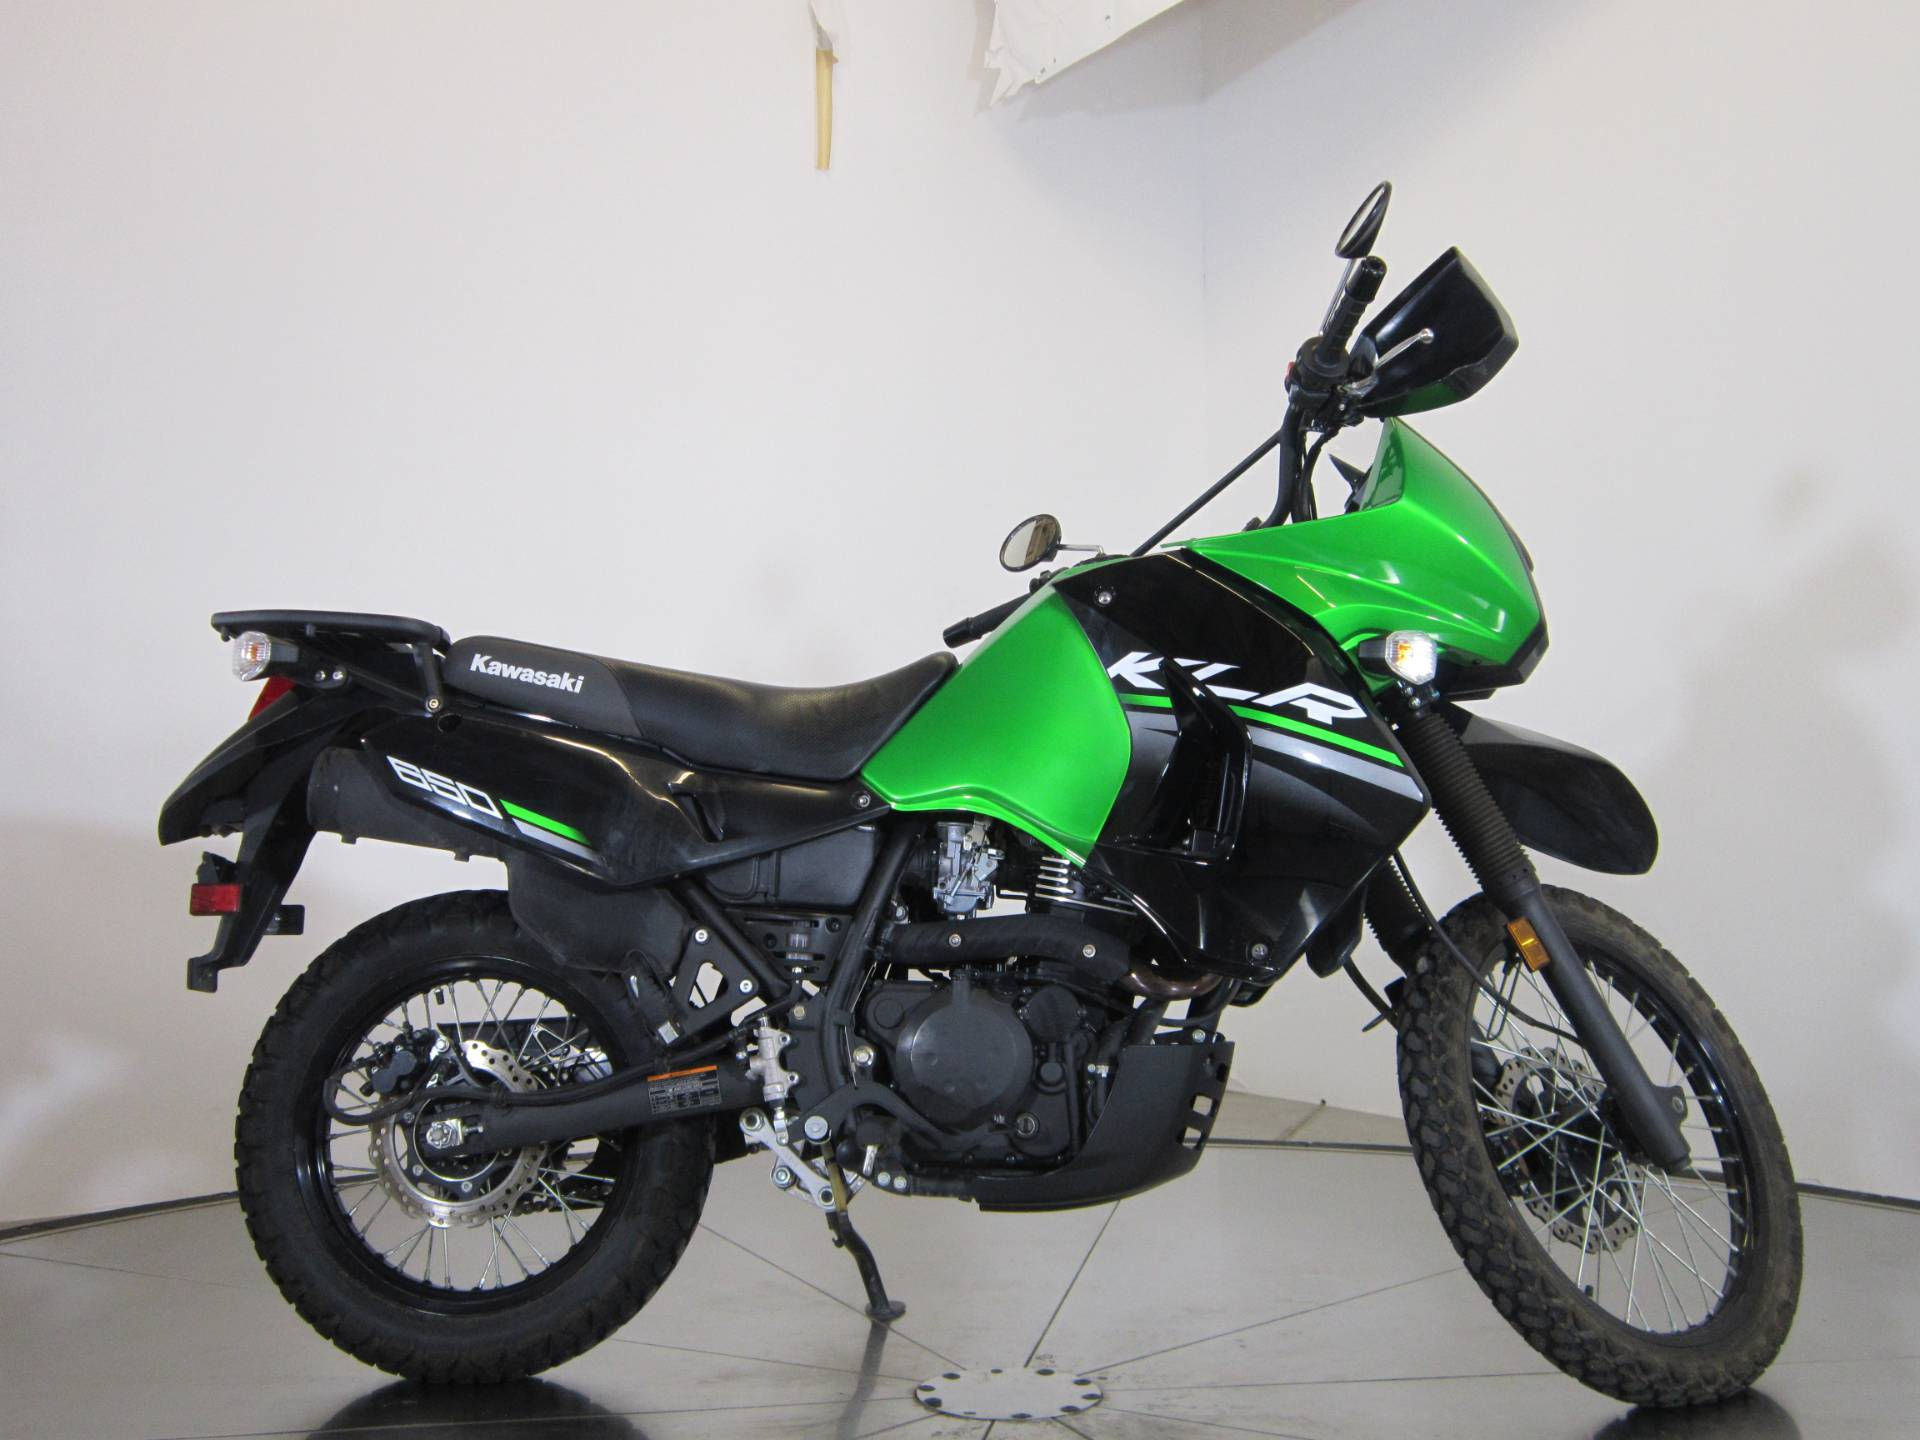 New 2016 Kawasaki Klr 650 Motorcycles In Greenwood Village Co